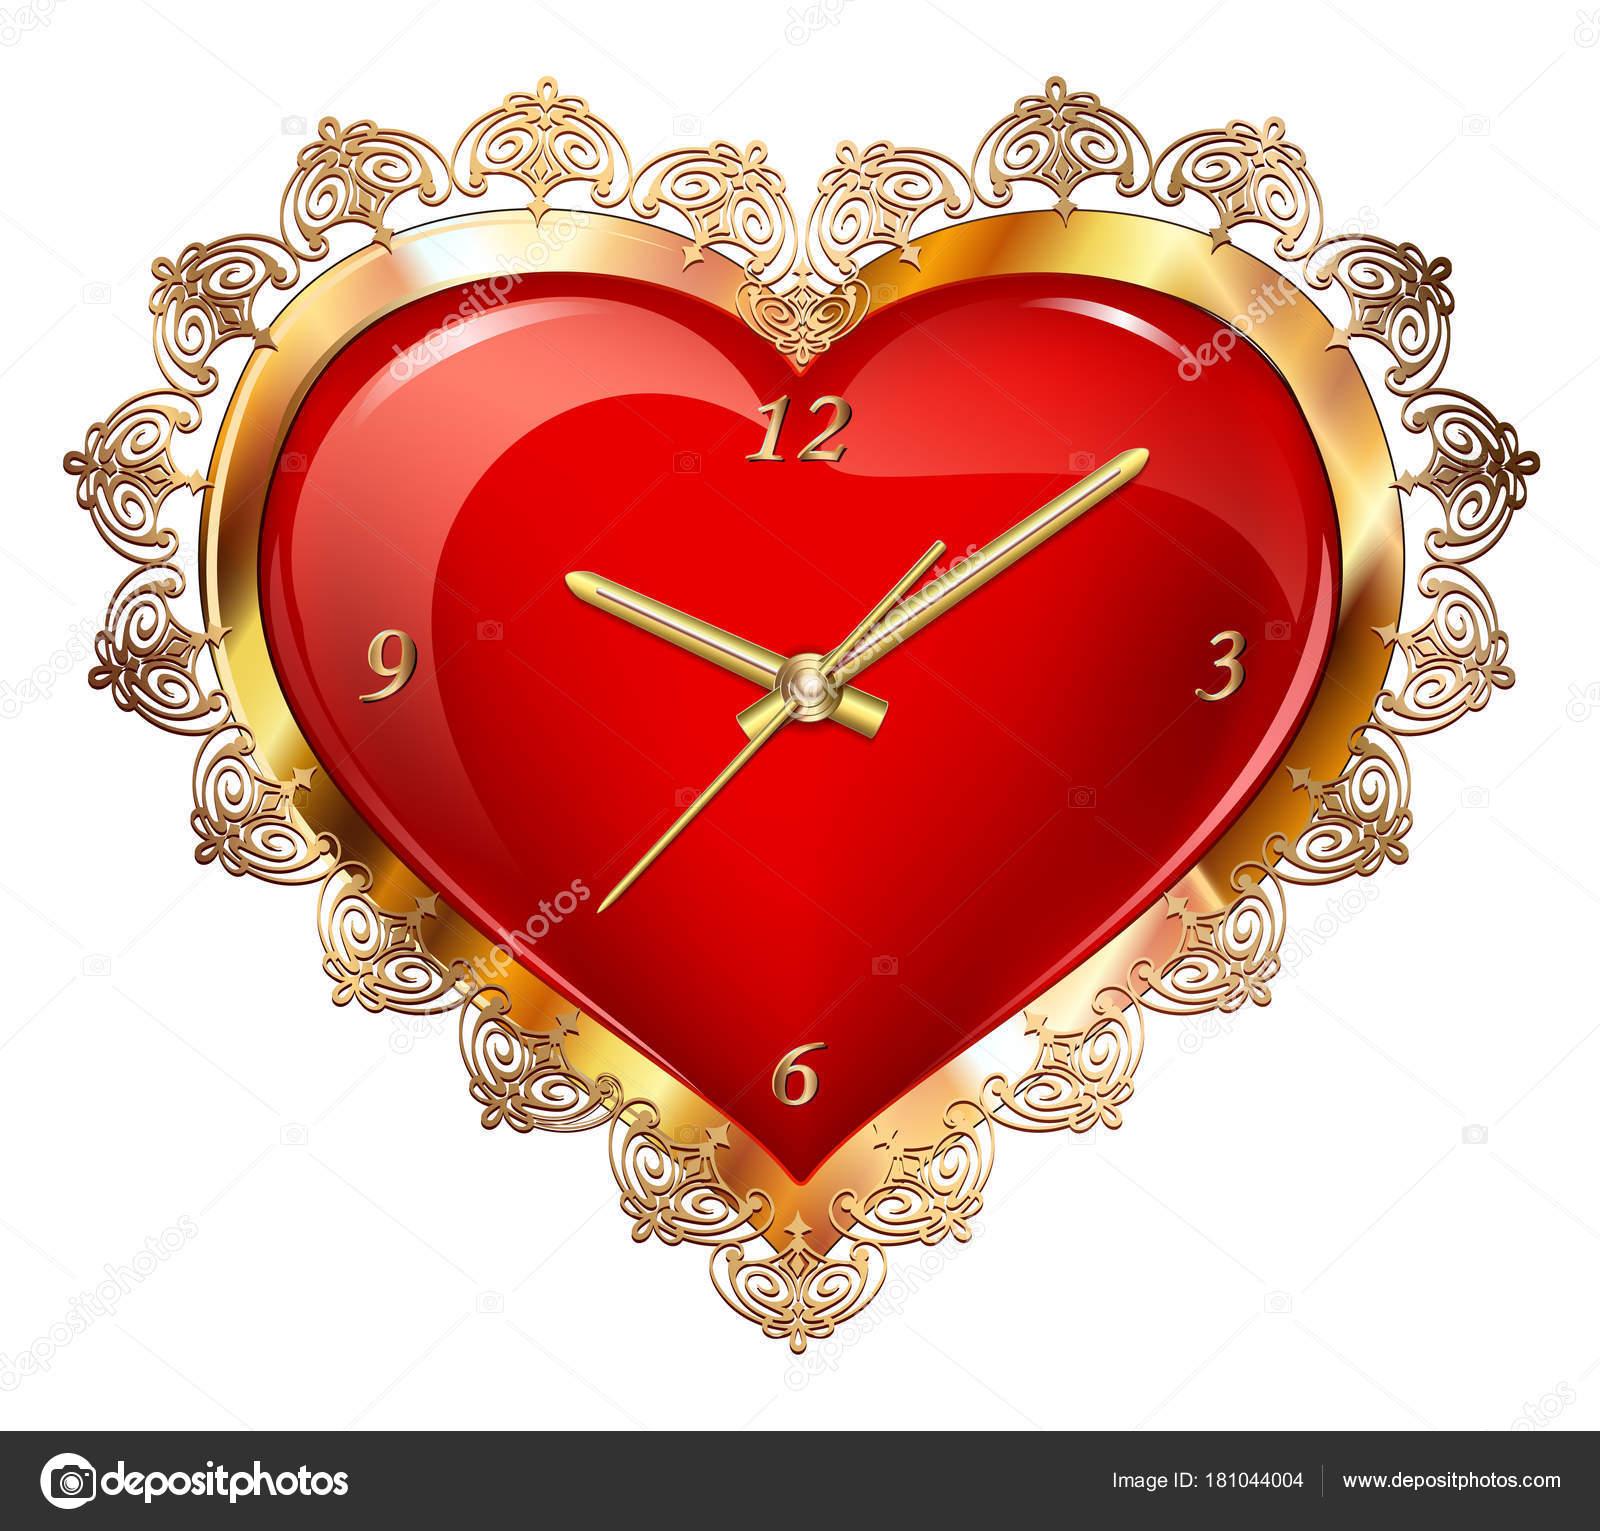 Corazón Rojo Con Reloj Marco Oro Con Adorno — Vector de stock ...